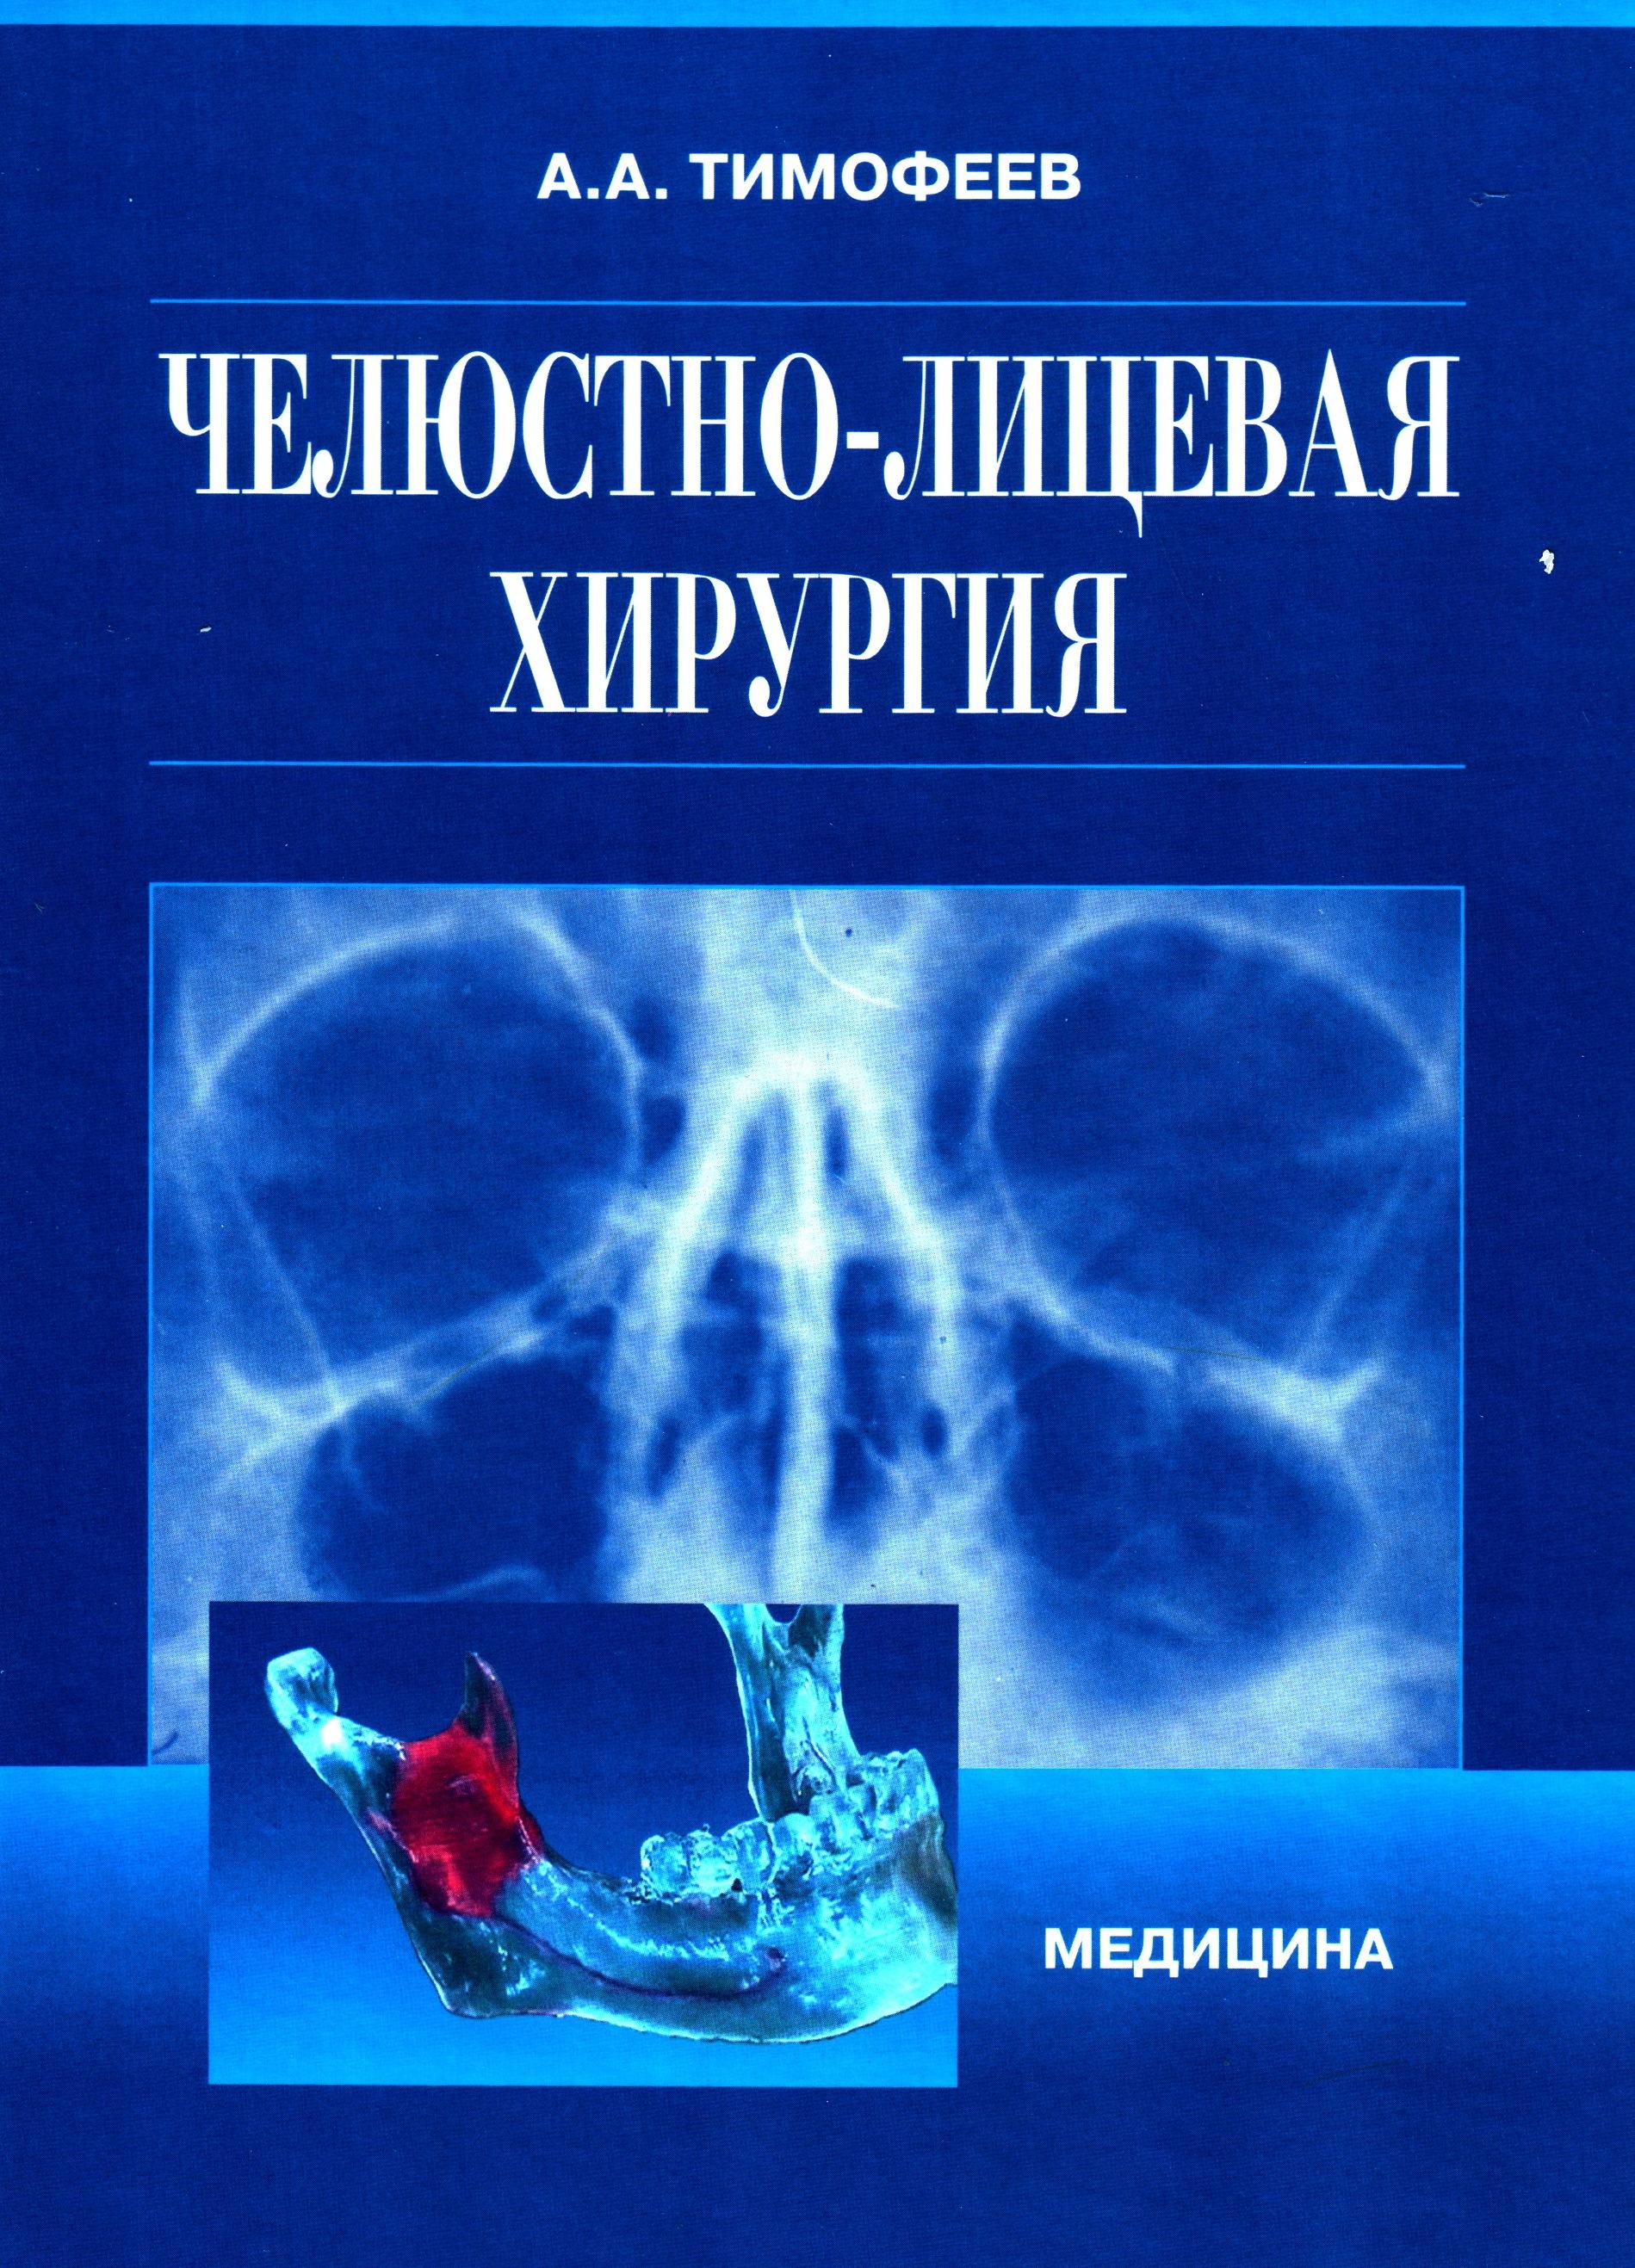 download Los libros de acedrex dados e tablas: Historical, artistic and metaphysical dimensions of